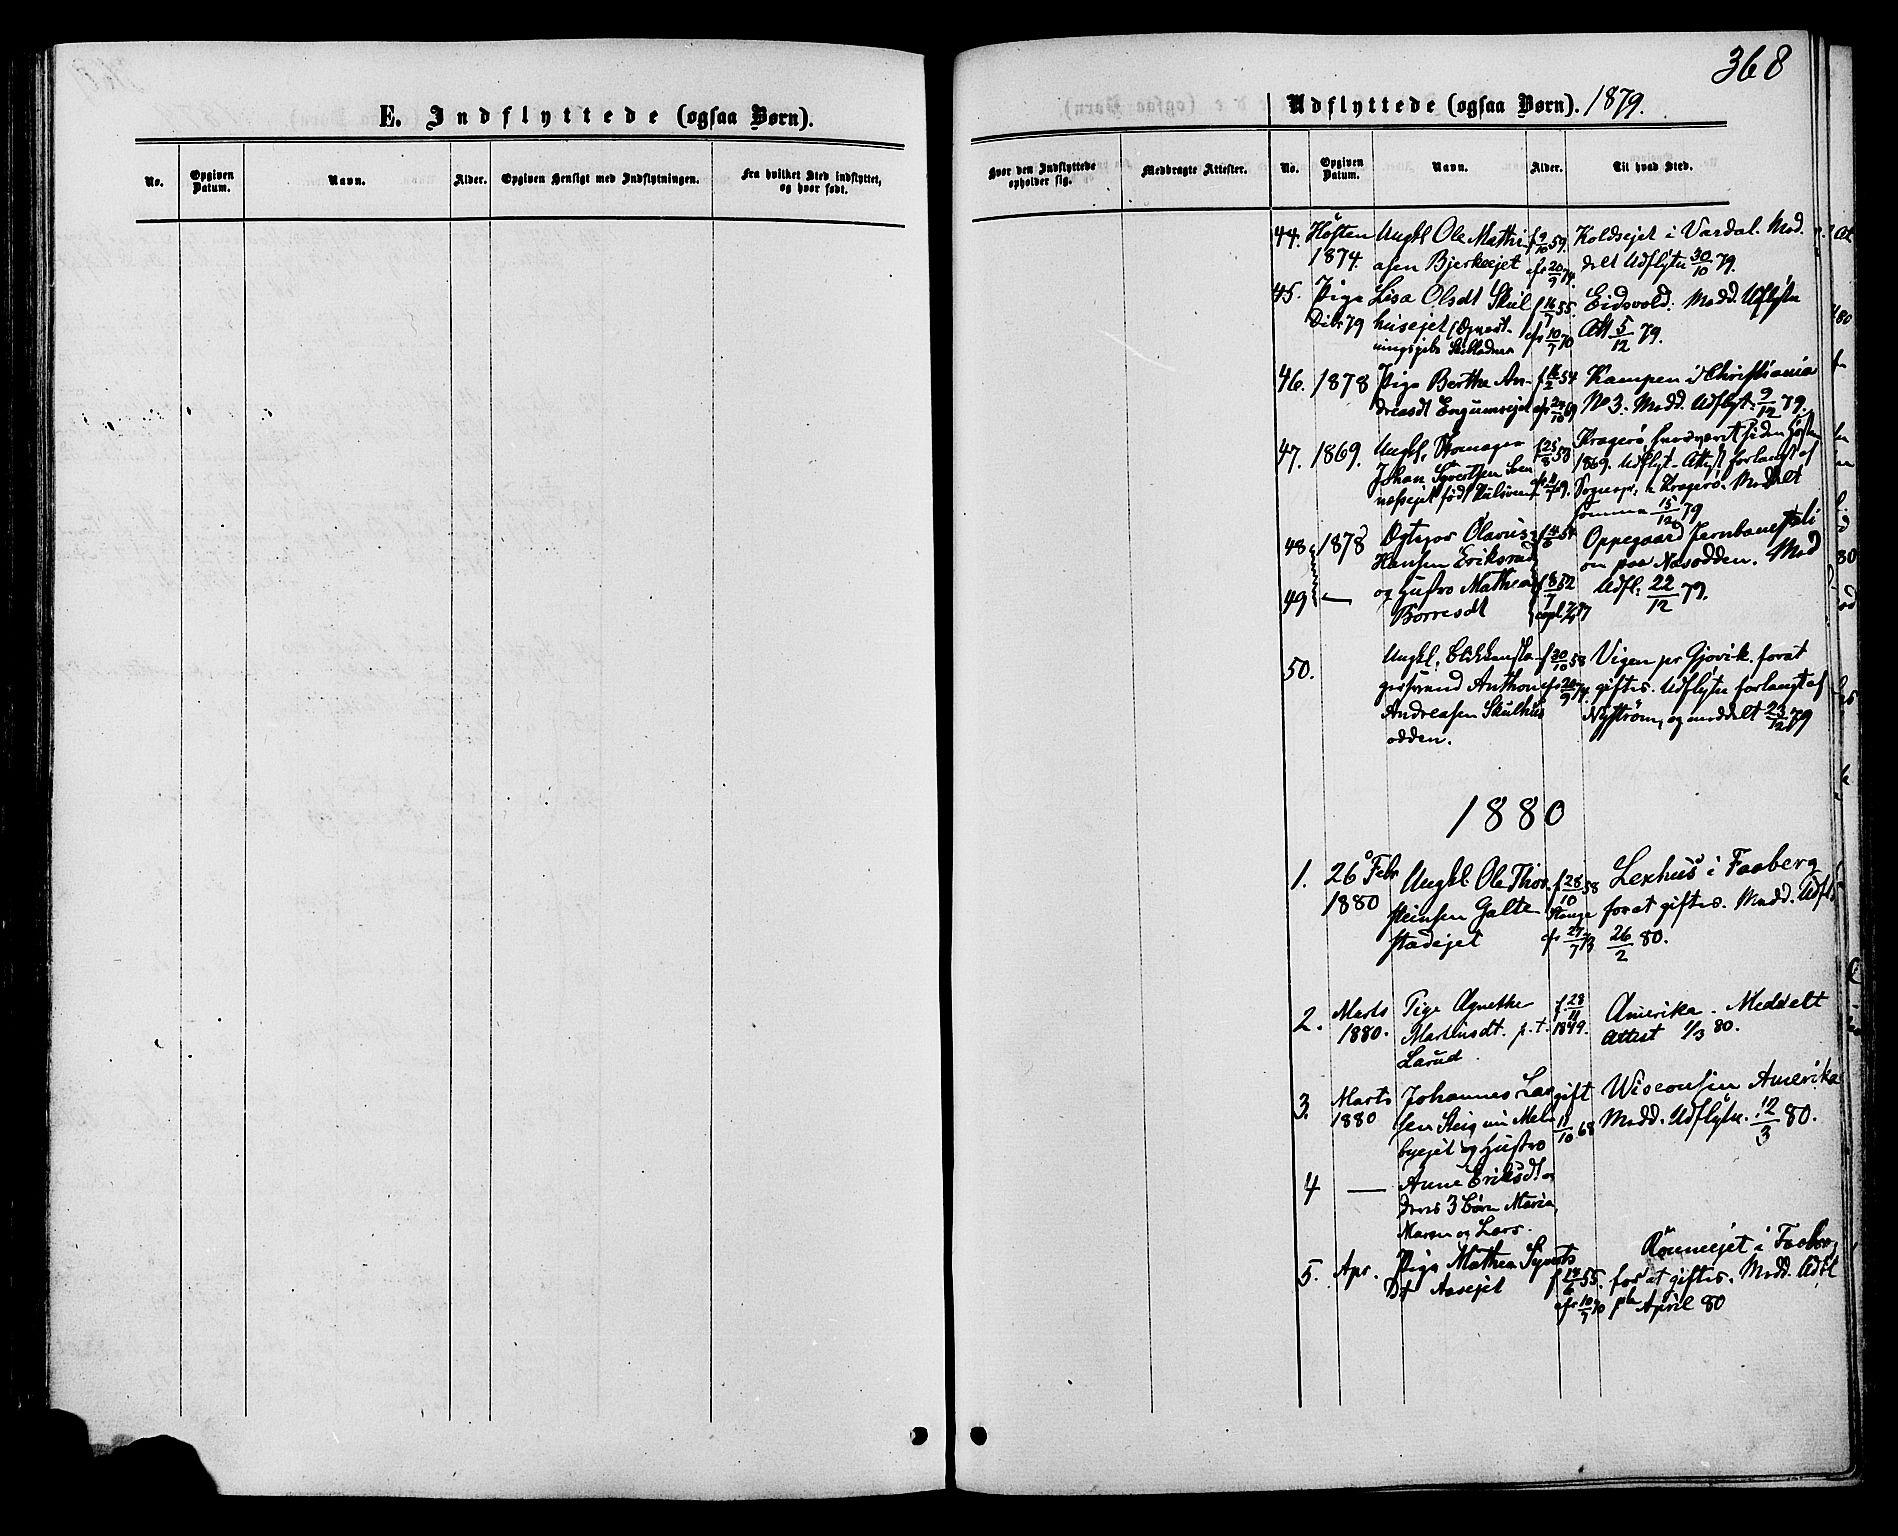 SAH, Biri prestekontor, Ministerialbok nr. 6, 1877-1886, s. 368